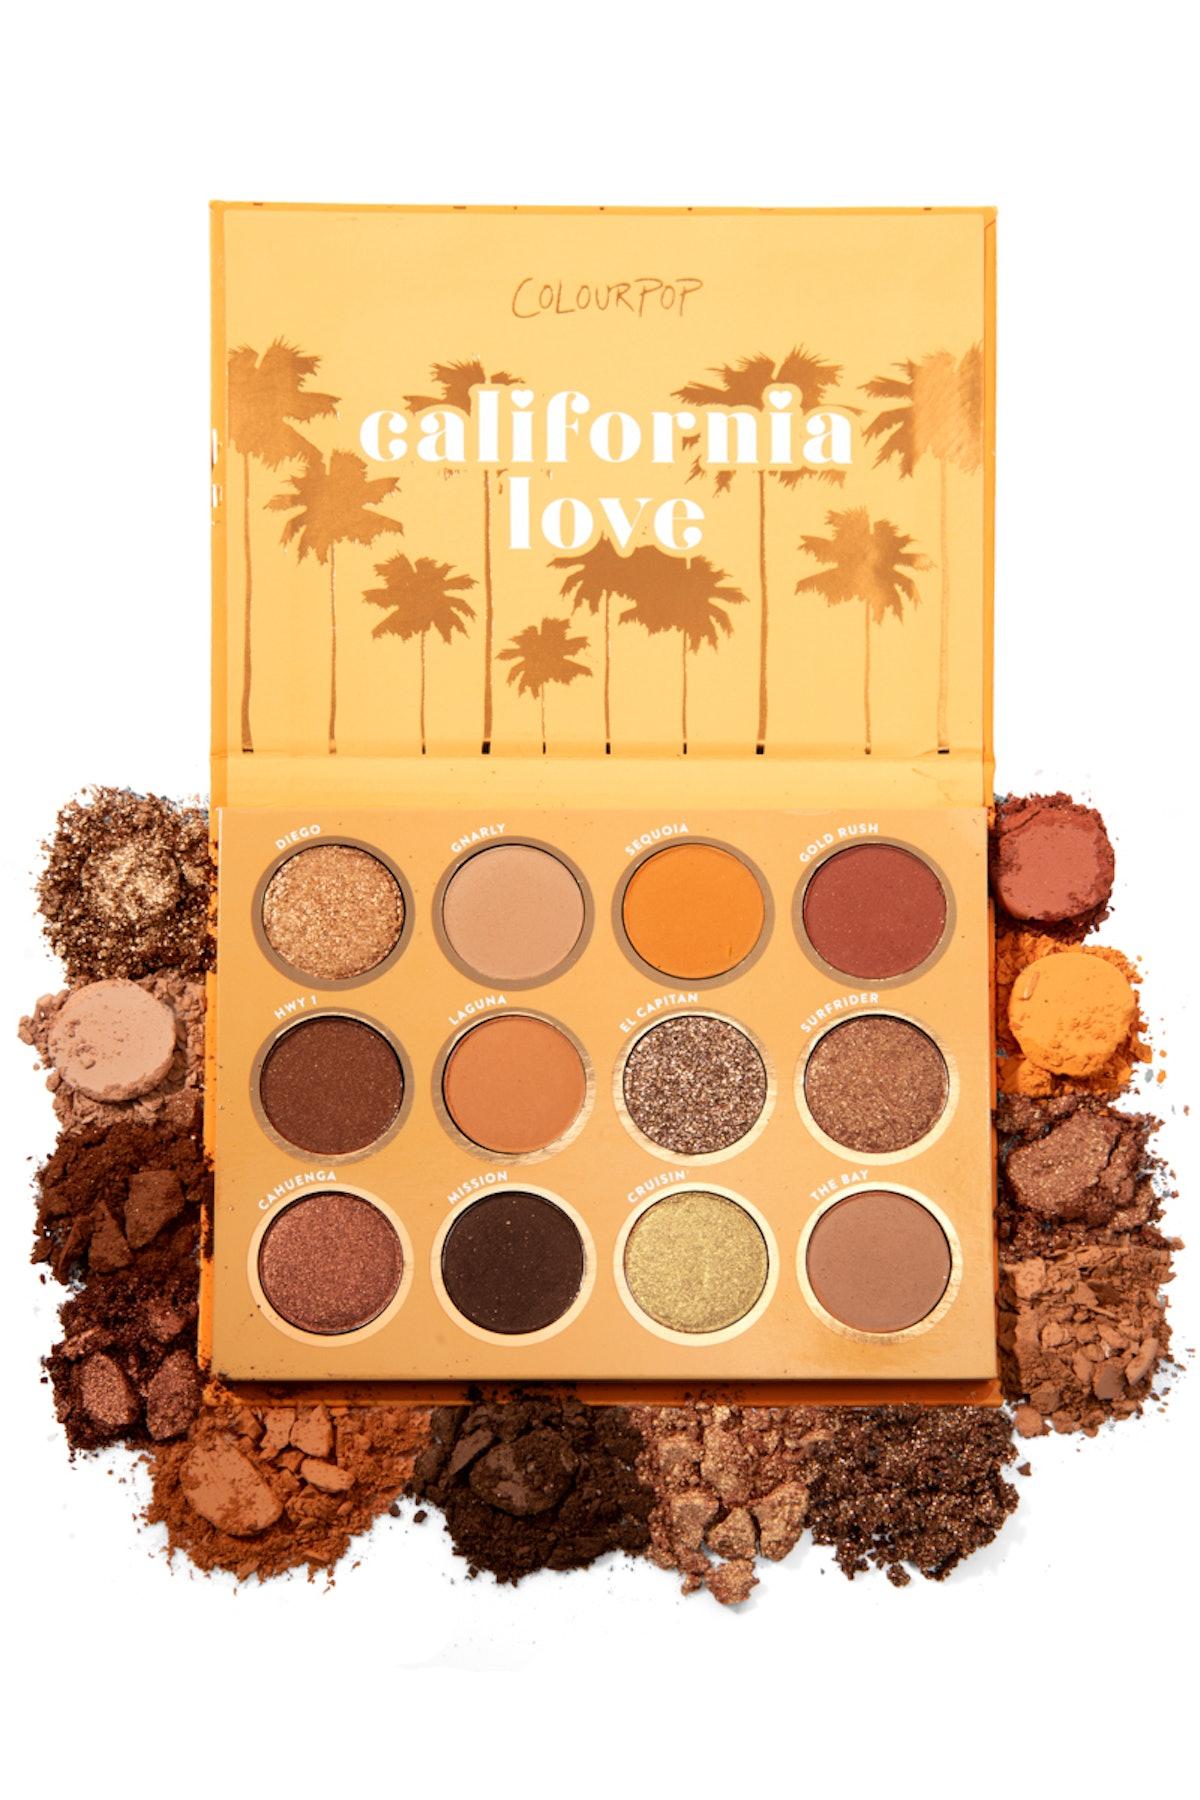 California Love Palette